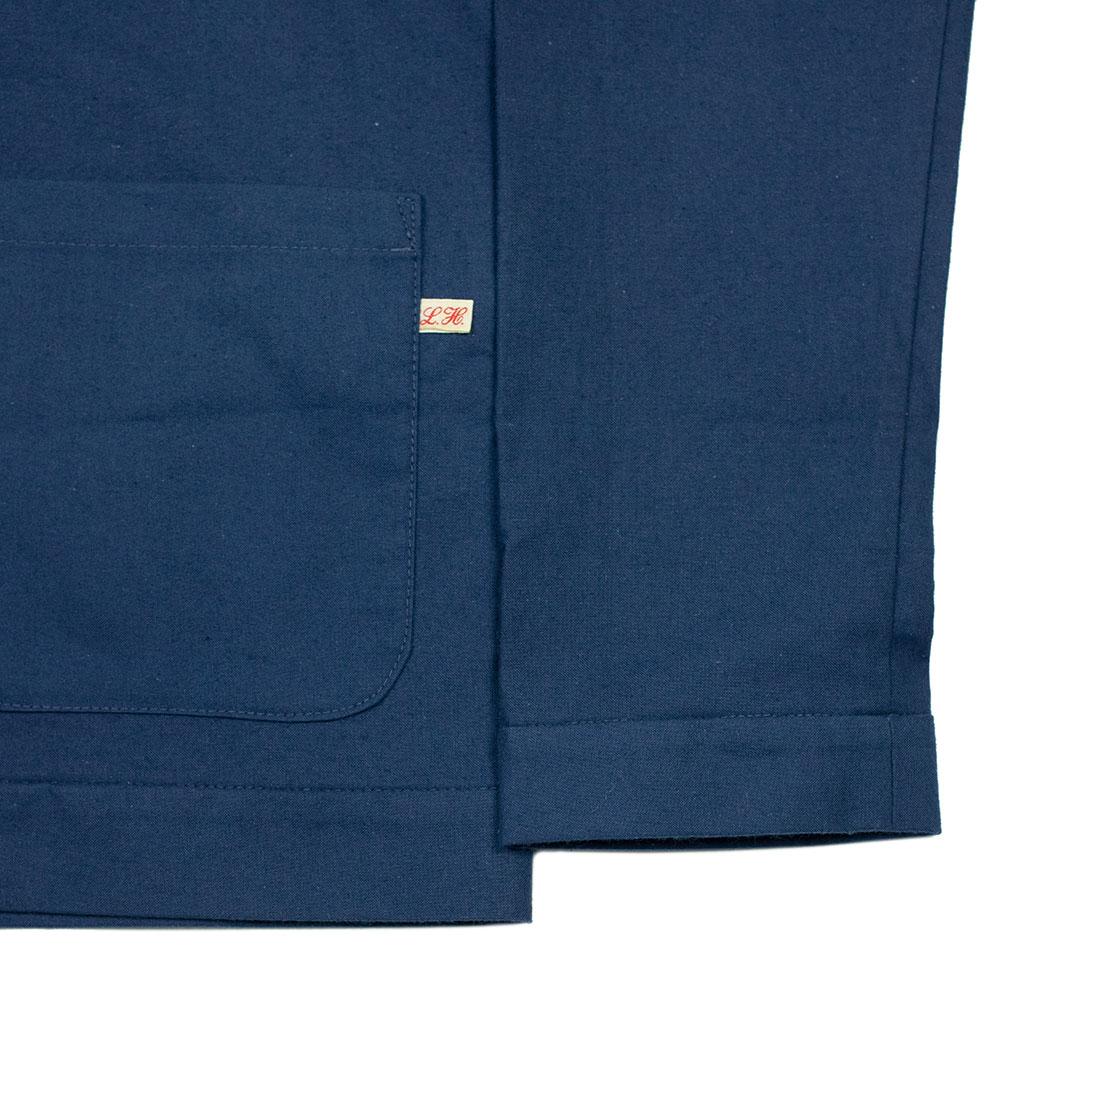 Frank Leder Spring Summer 2021 SS21 Made in Germany deadstock indigo dyed bed linen (1).jpg